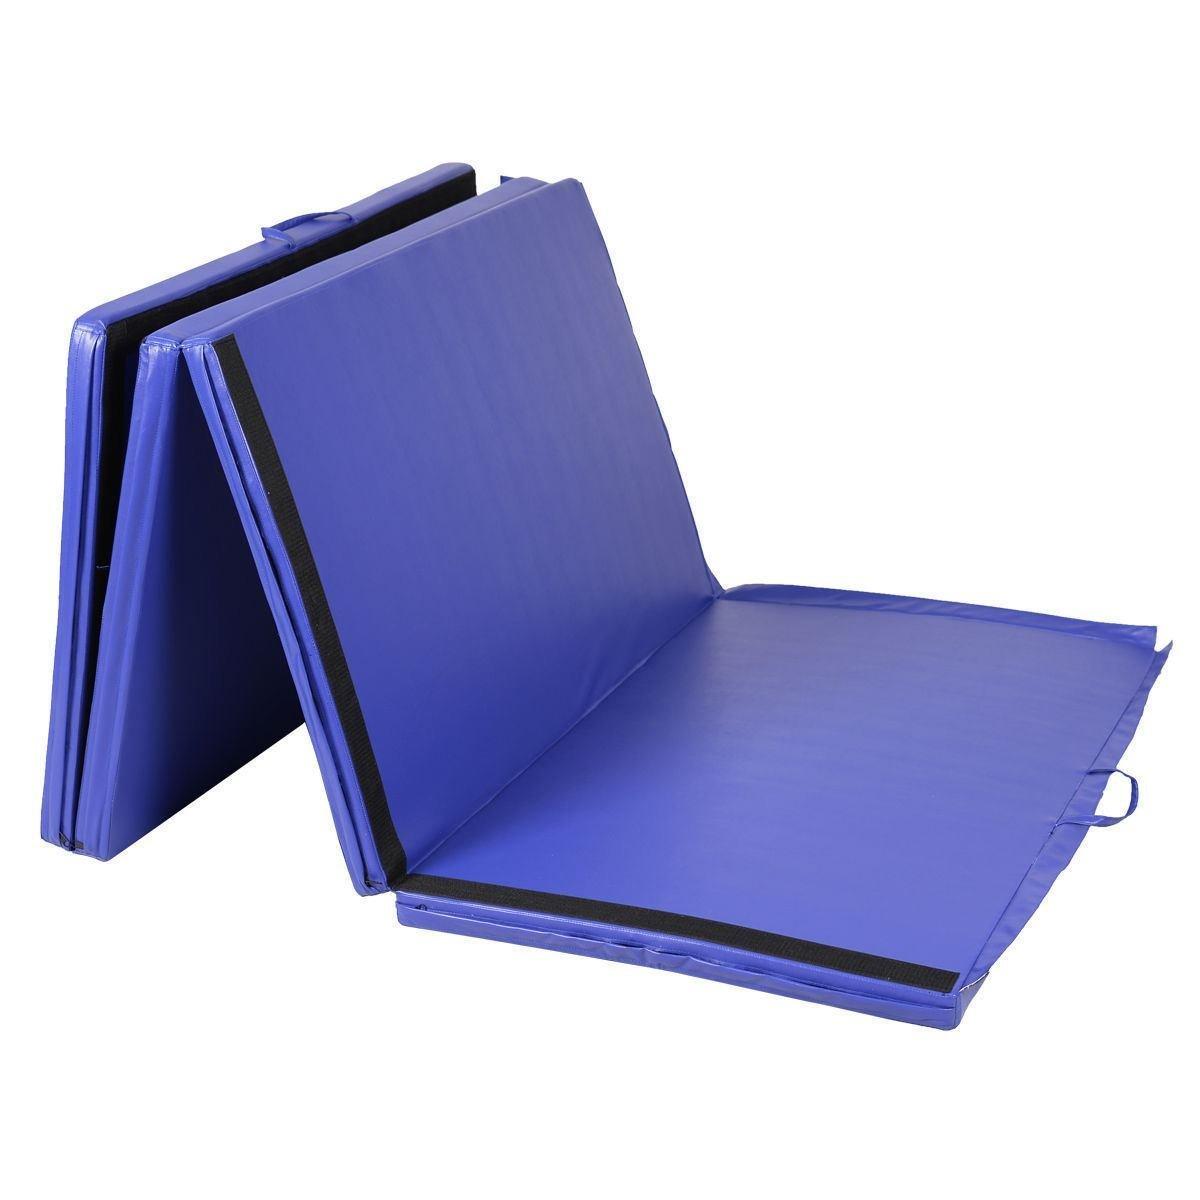 dollamur flexi mats products cheer floor crash smai flooring mat connect